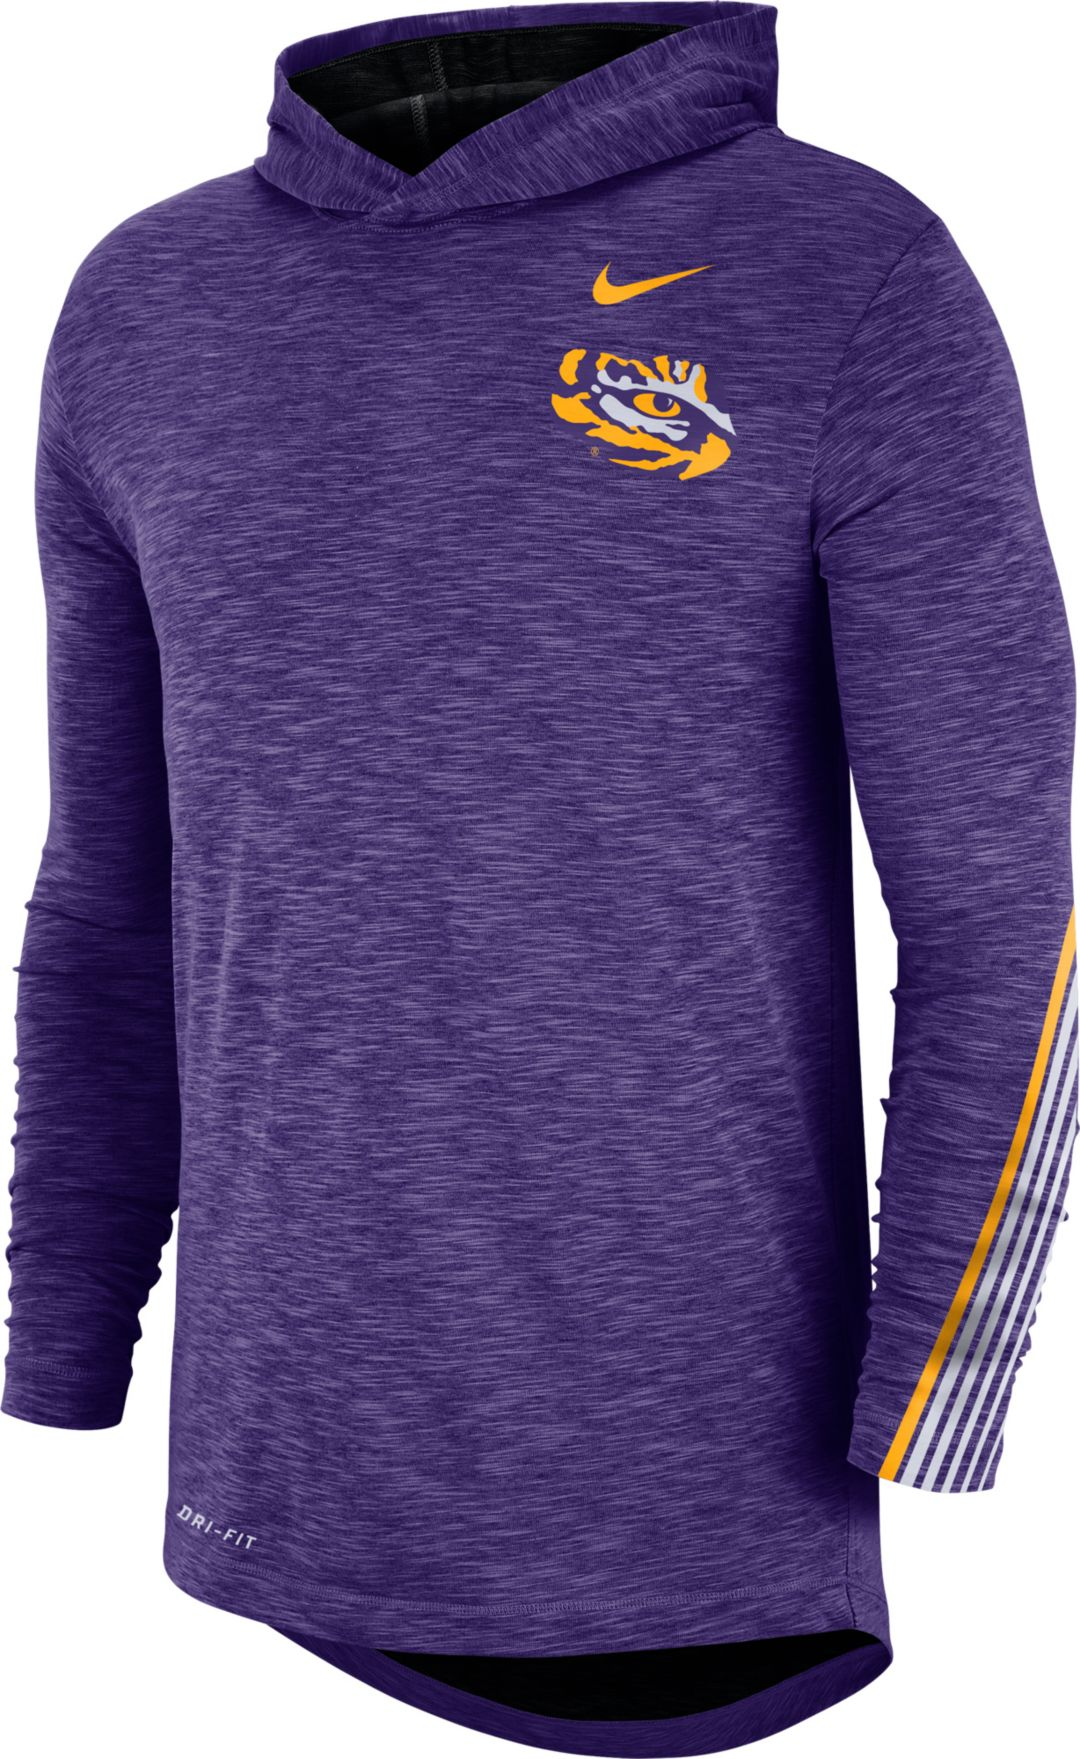 Nike Men's LSU Tigers Purple Cotton Long Sleeve Hoodie T Shirt